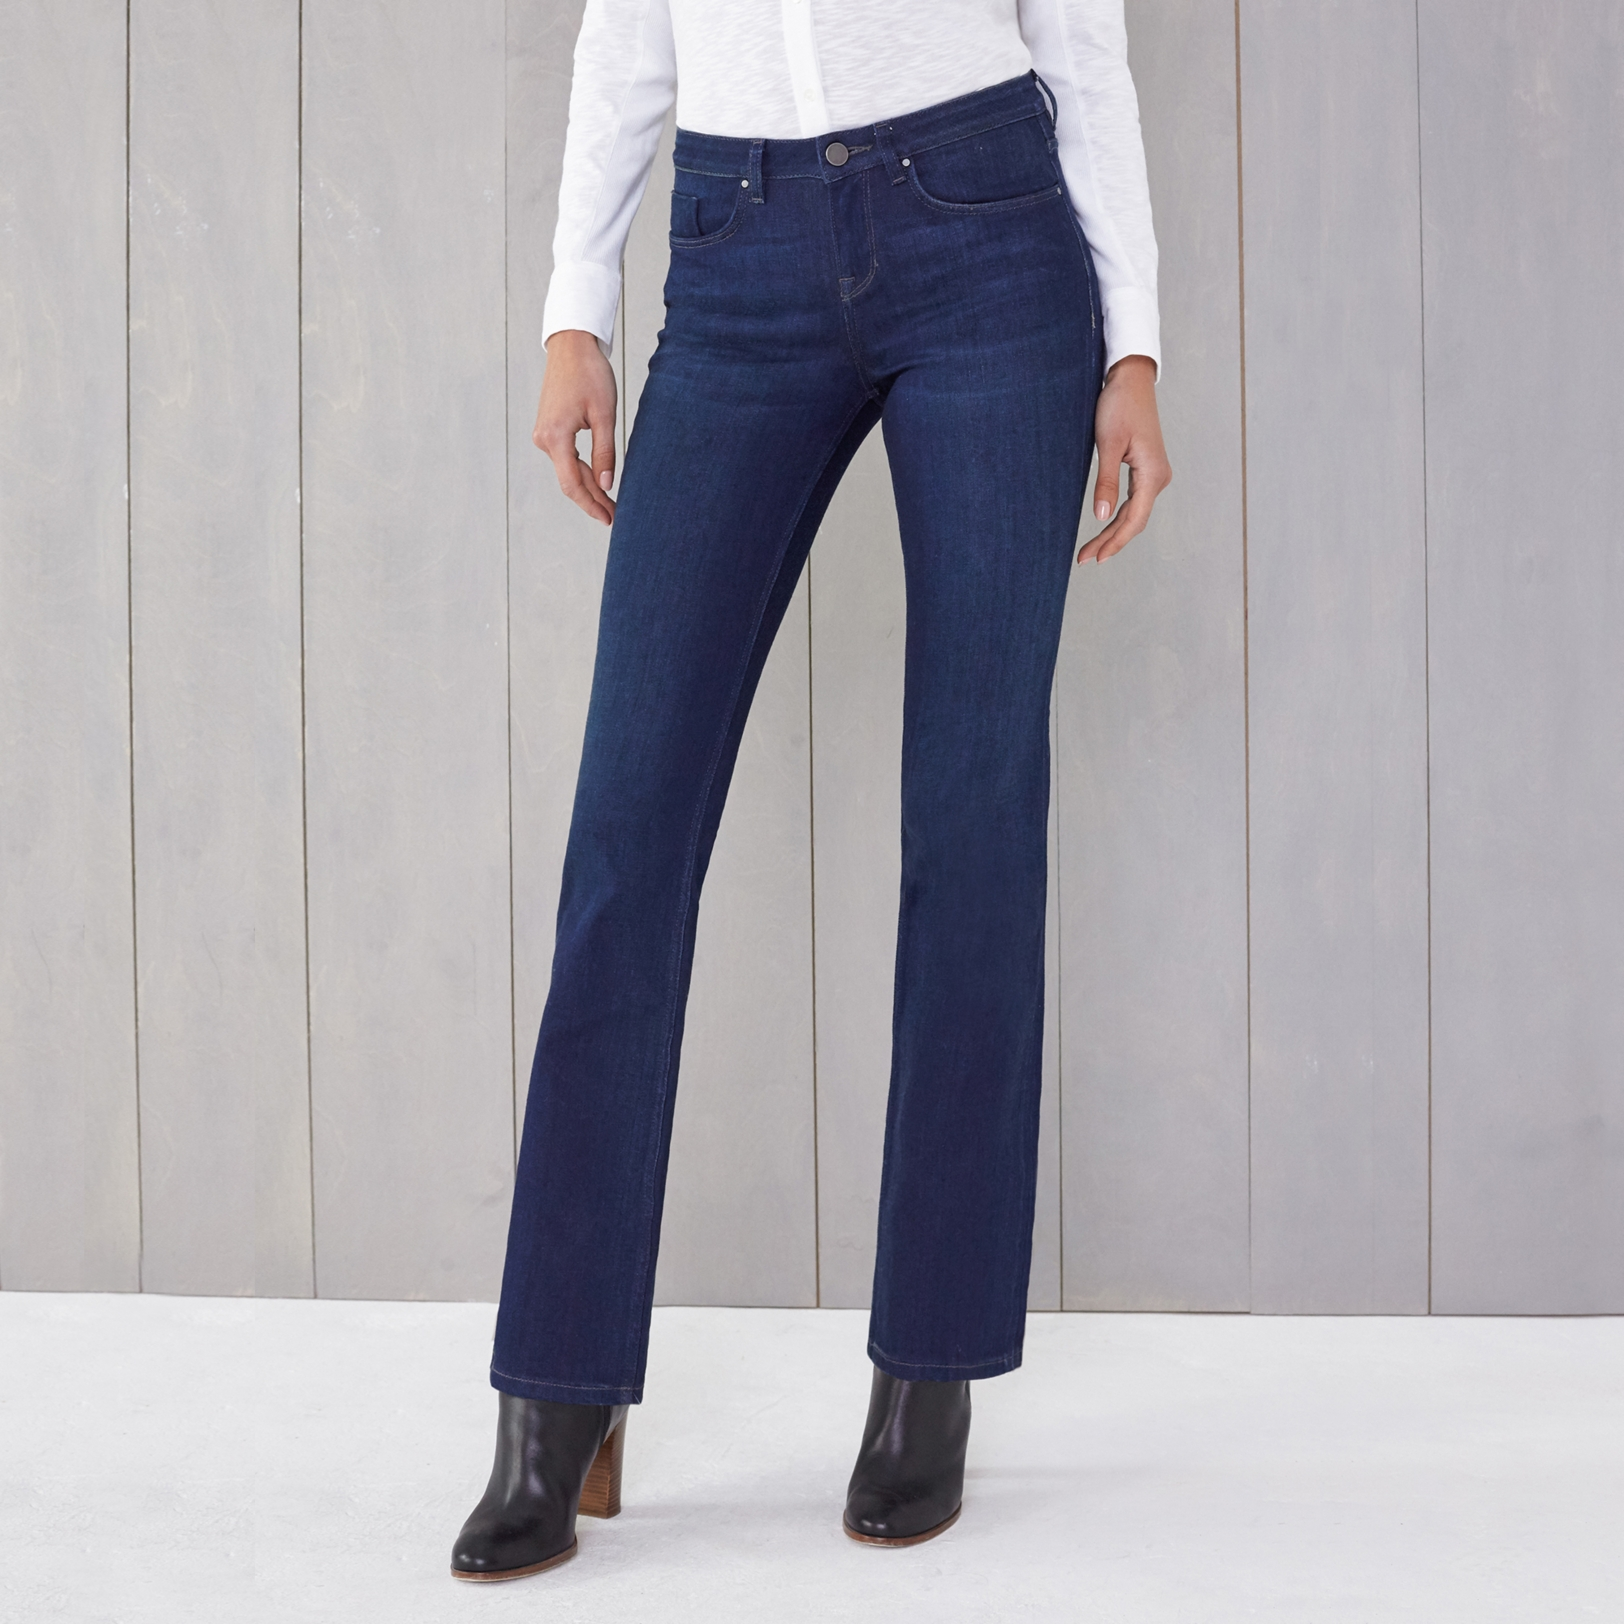 Jeans   Boyfriend & Skinny   The White Company UK